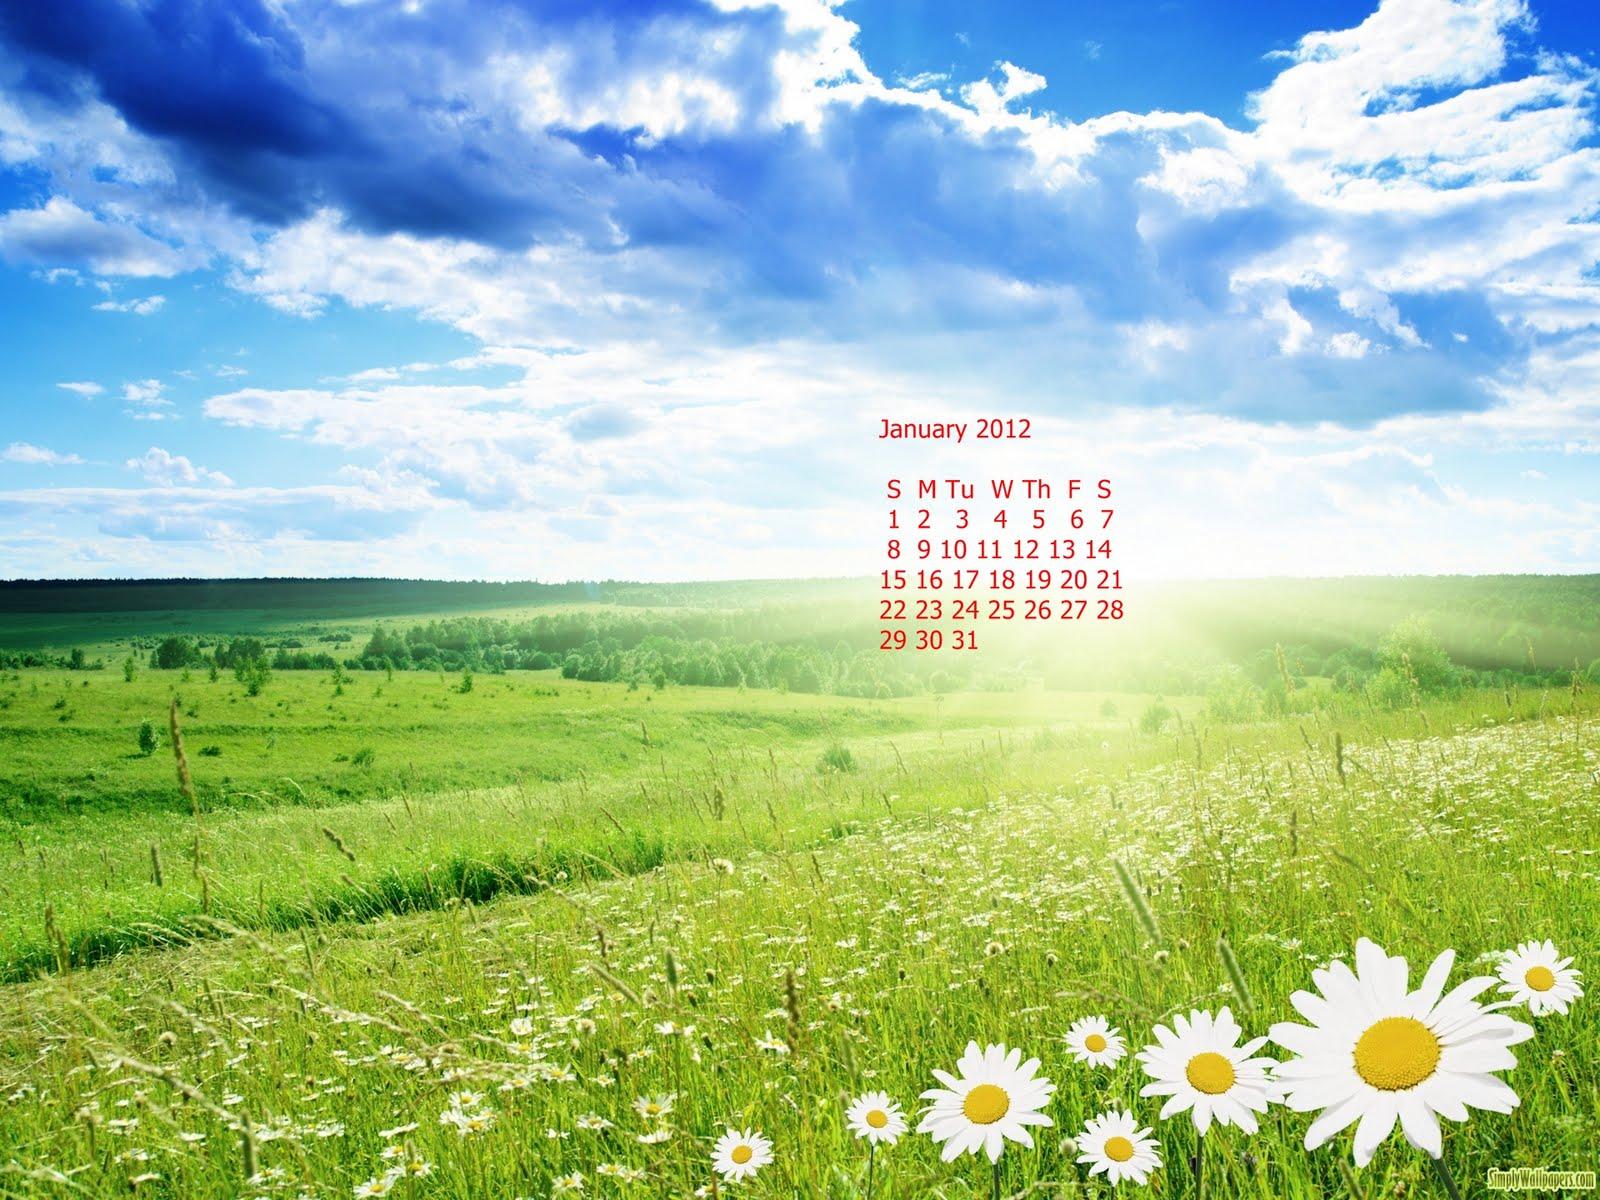 http://4.bp.blogspot.com/-l1Bn9-CI144/TuArQ62qviI/AAAAAAAAFWM/CvjSBJ0zywg/s1600/1.jpg